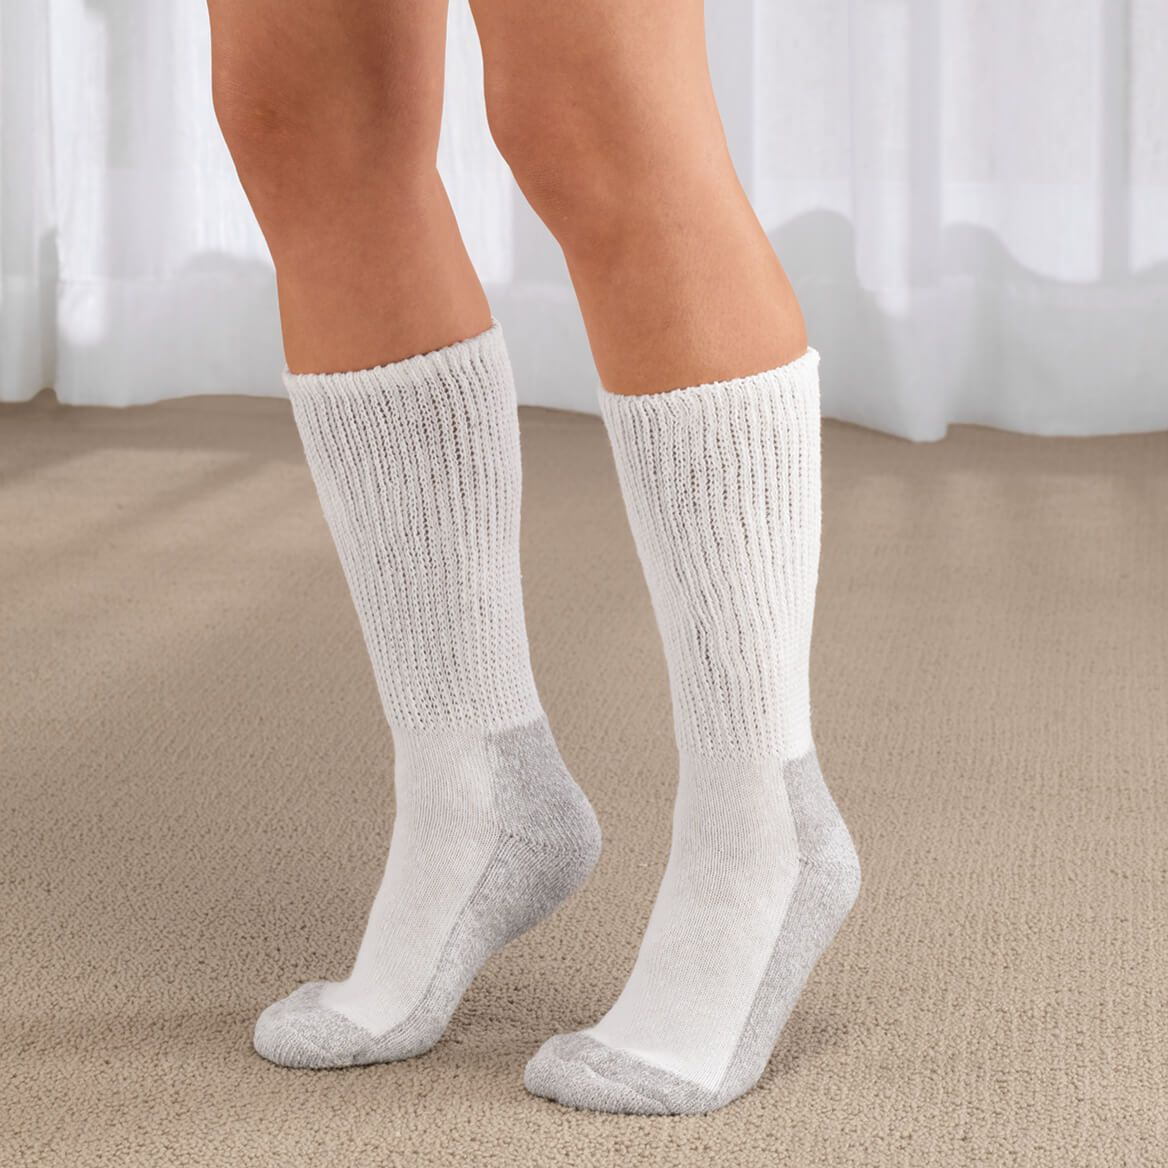 Women's Diabetic Socks - 2 Pair-304496